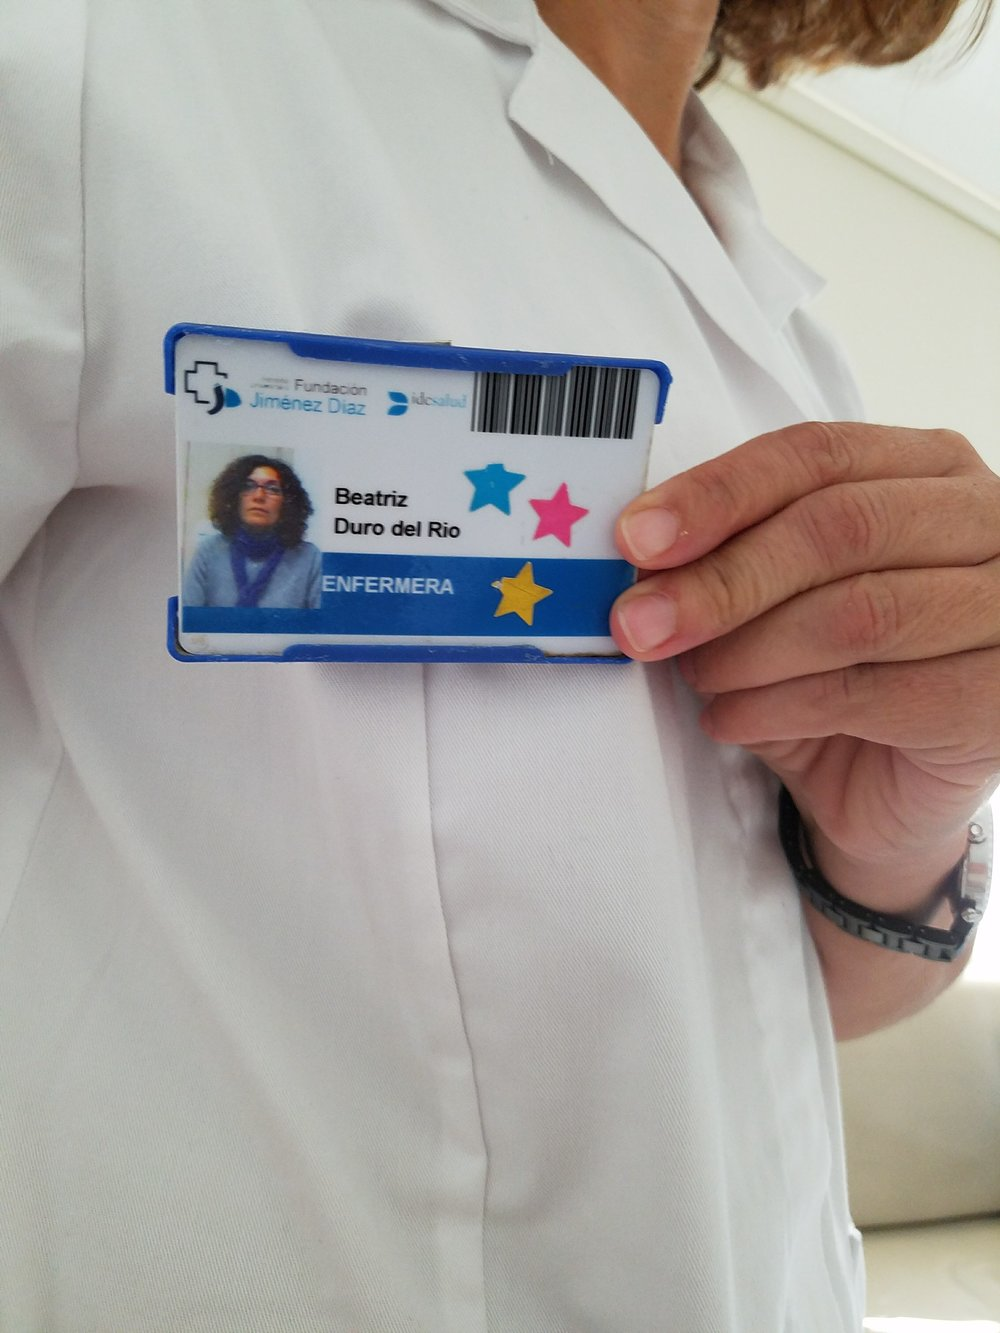 Overnight nurse at Fundacion Jimenez Diaz (2).jpg